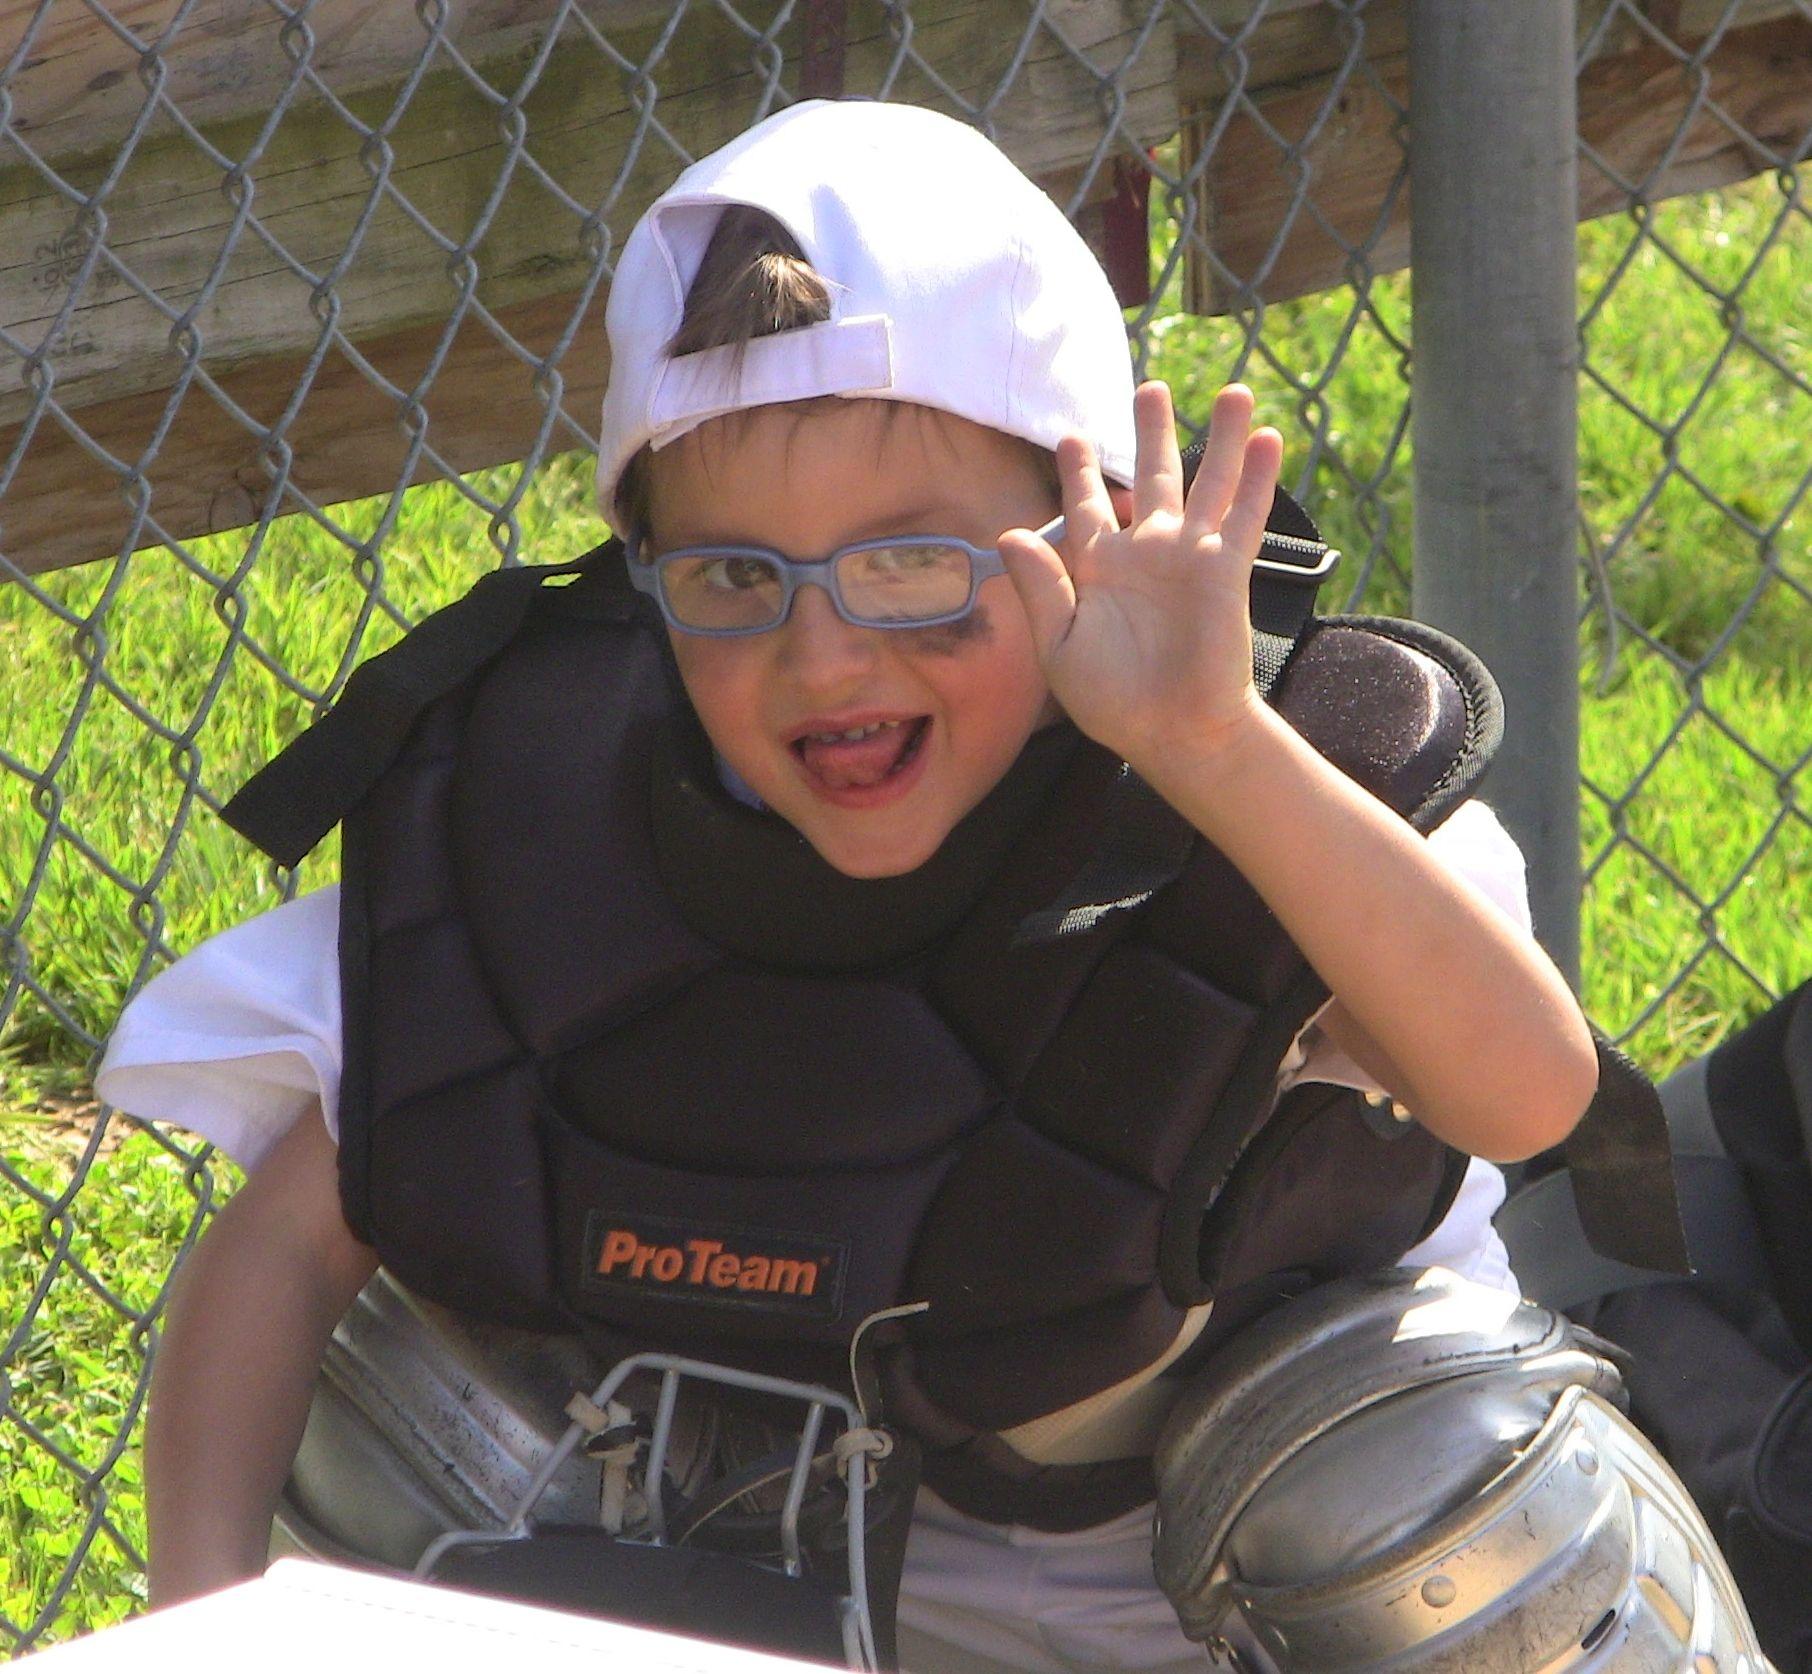 cutest catcher ever